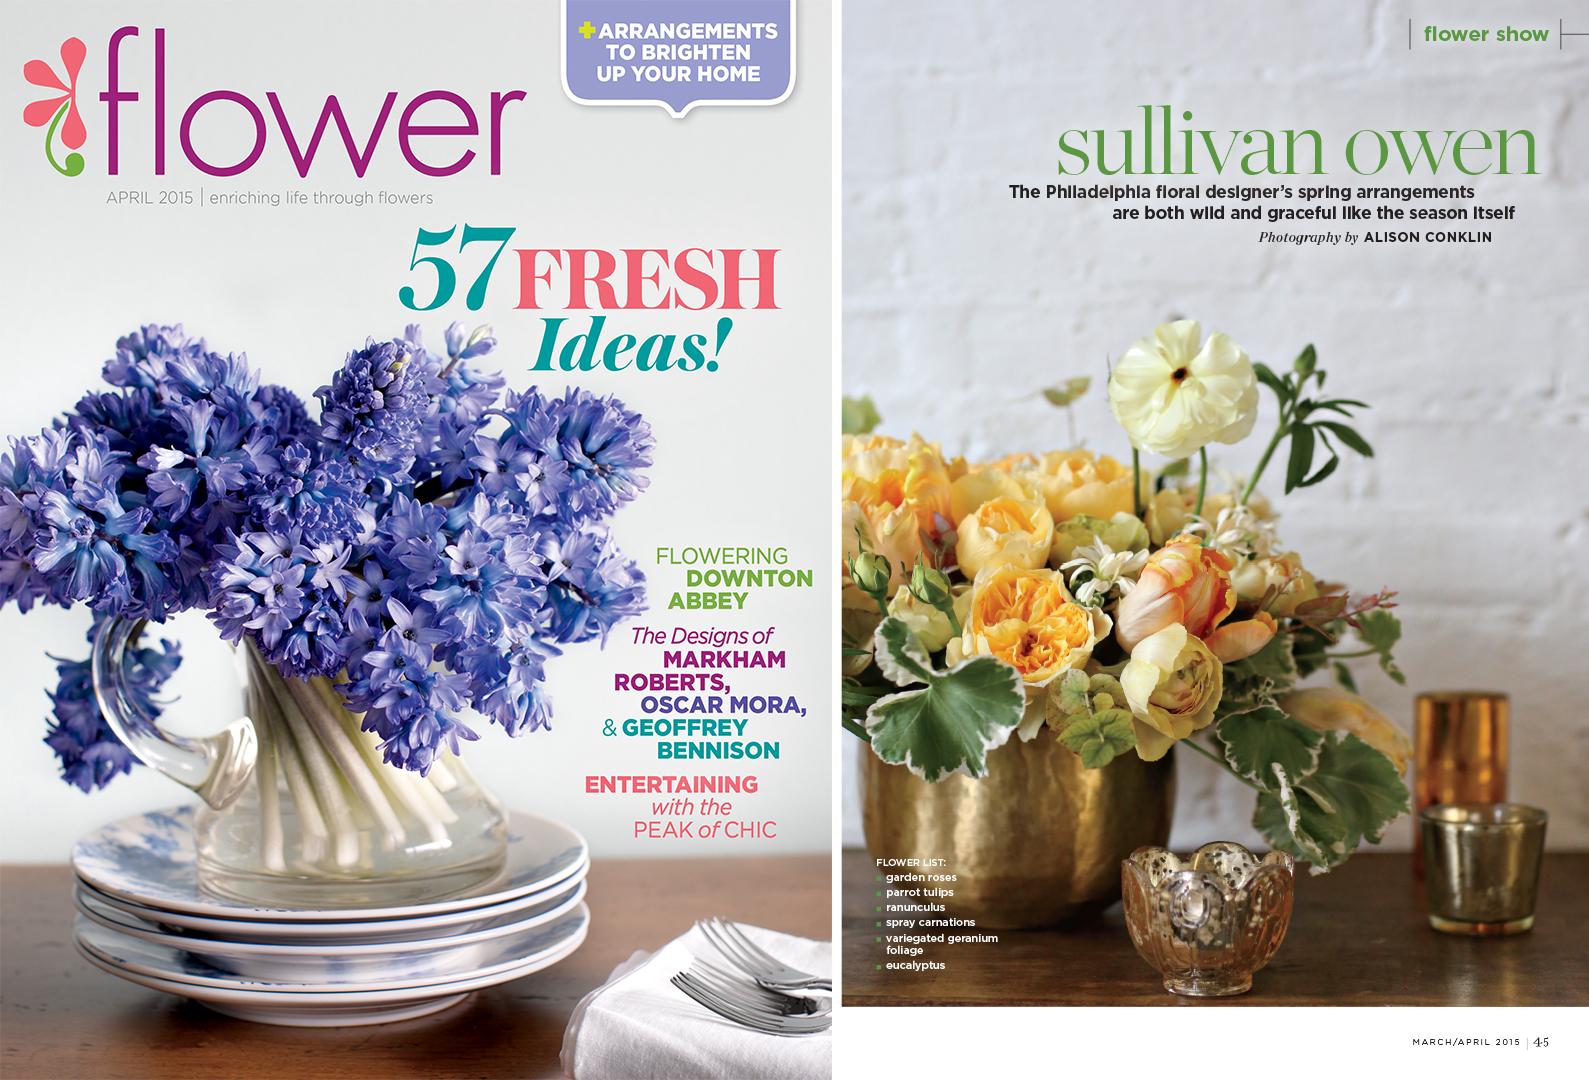 Flower Magazine April 2015